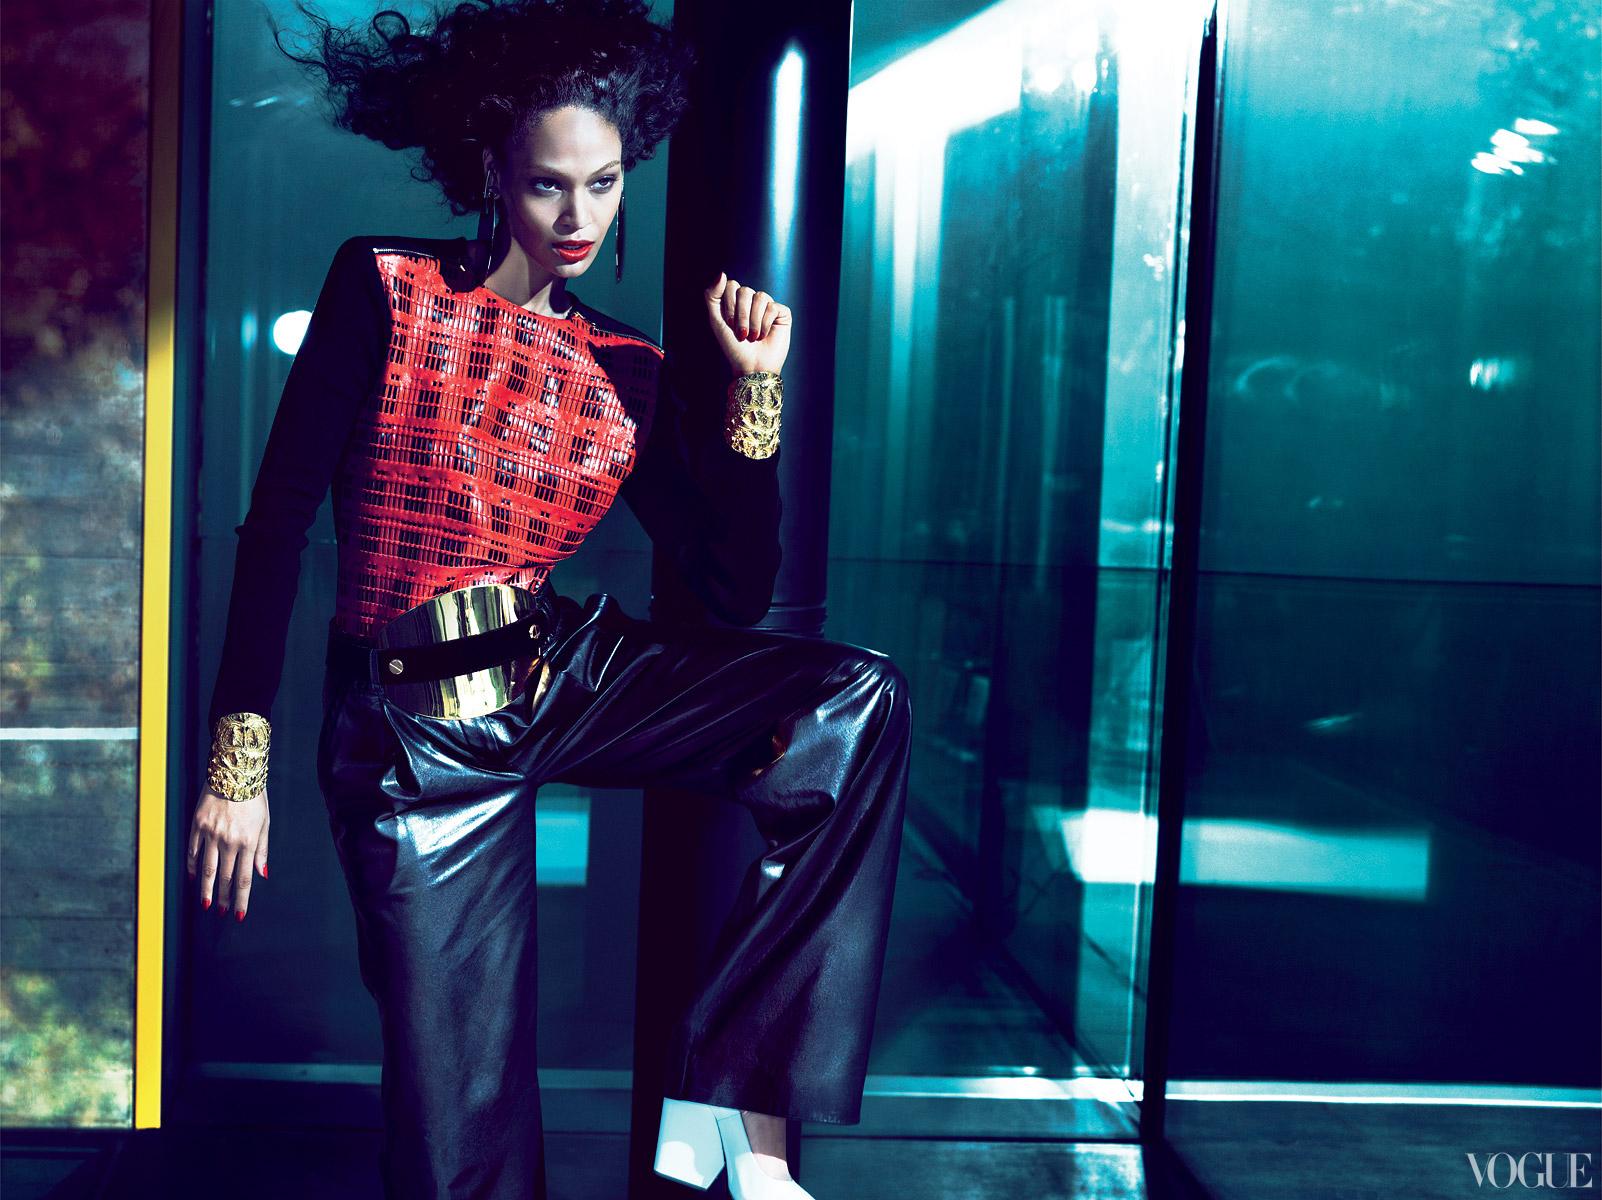 Joan Smalls Mert Alas Marcus Piggott Photoshoot 2012 for Vogue 01.jpg